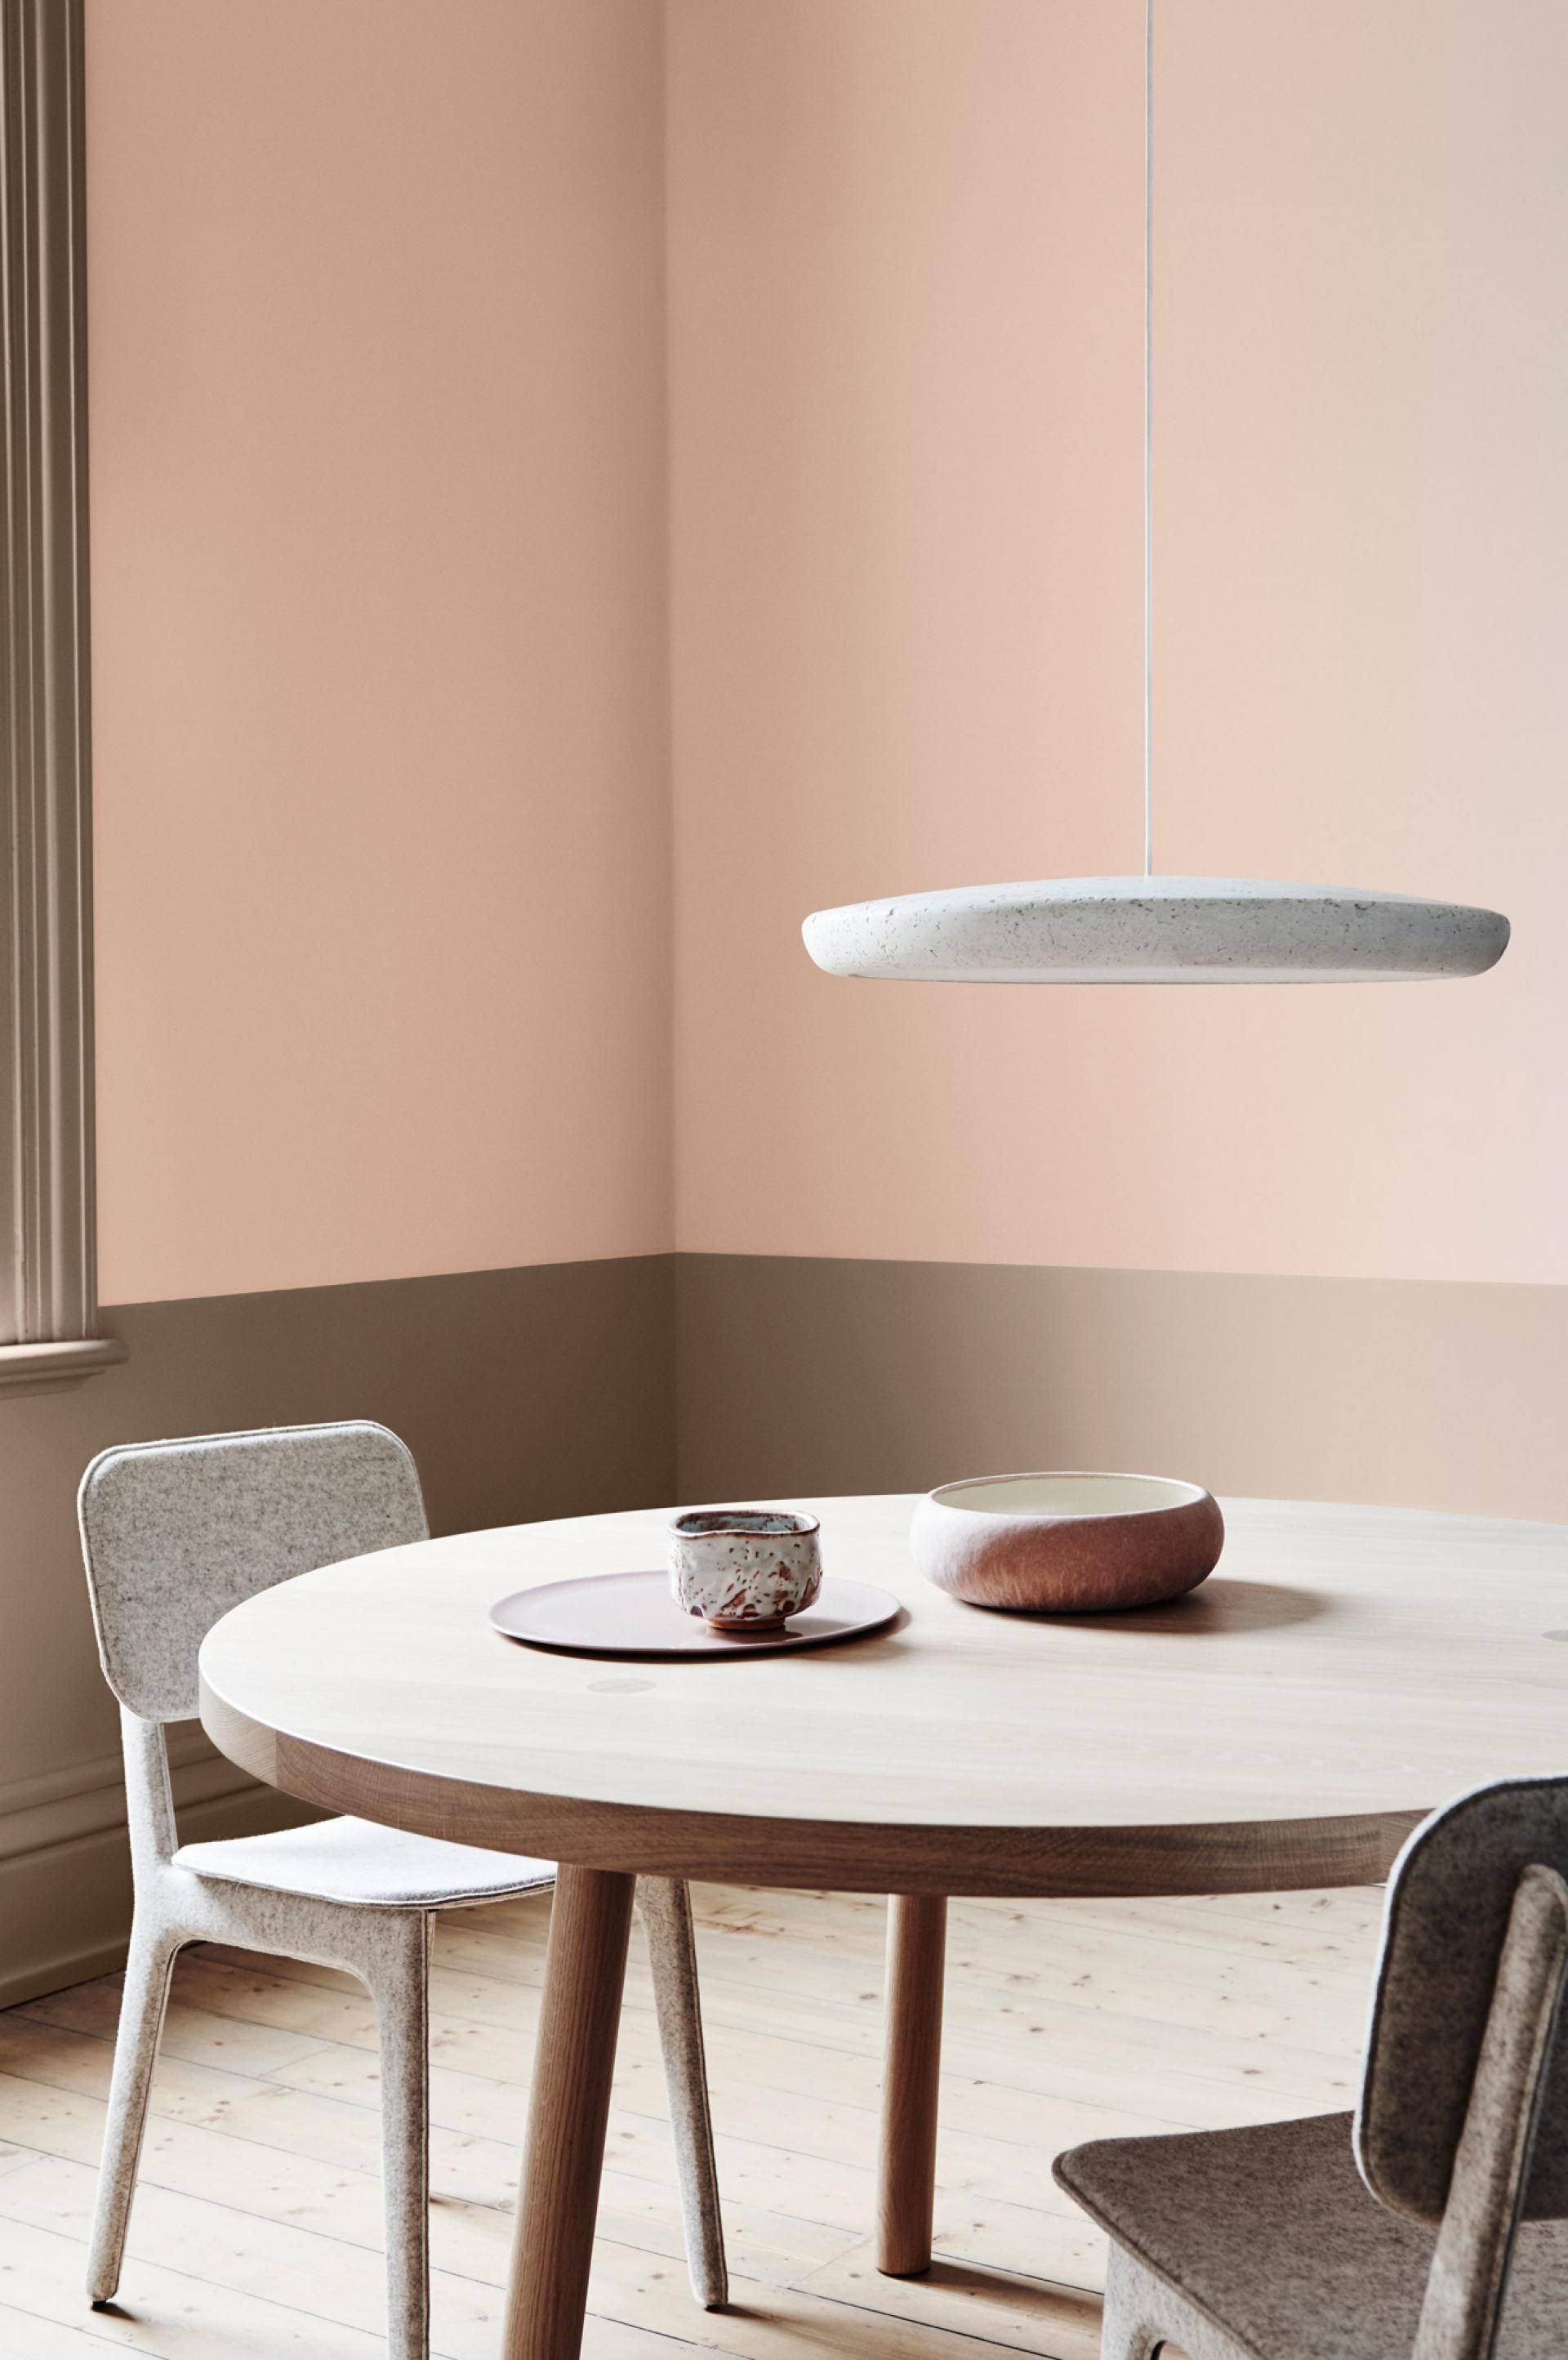 comedor-dulux-sensibilidad-Cohen-1-use.jpg | home goods | Pinterest ...